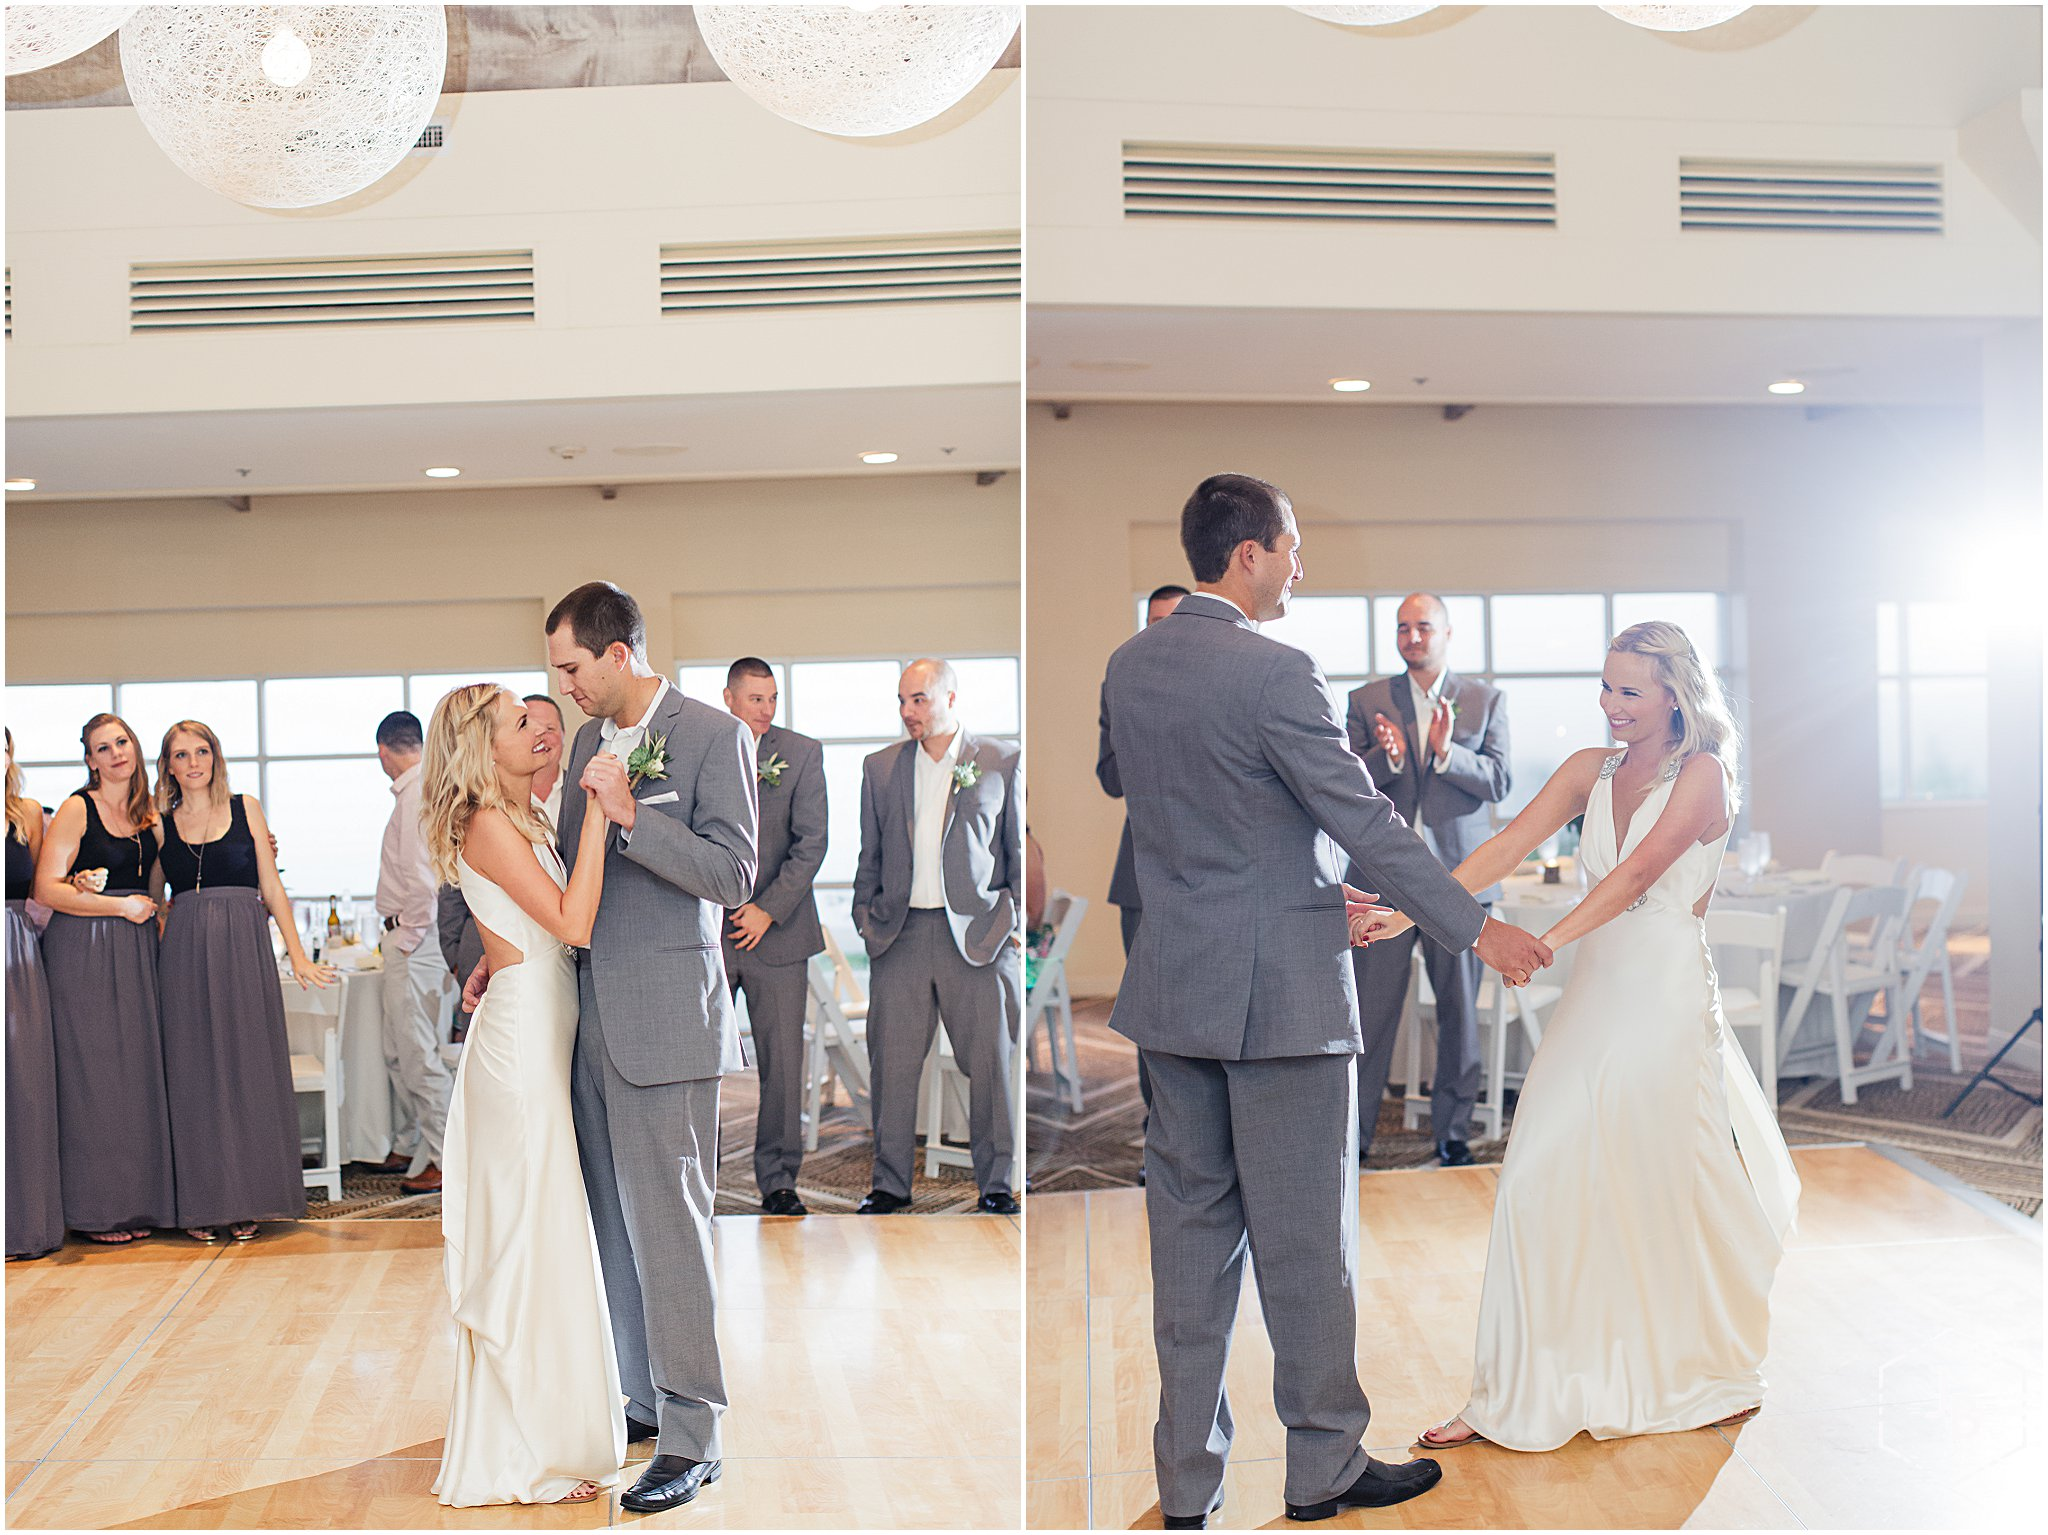 WeddingandEngagementFloridaPhotographer_1142.jpg